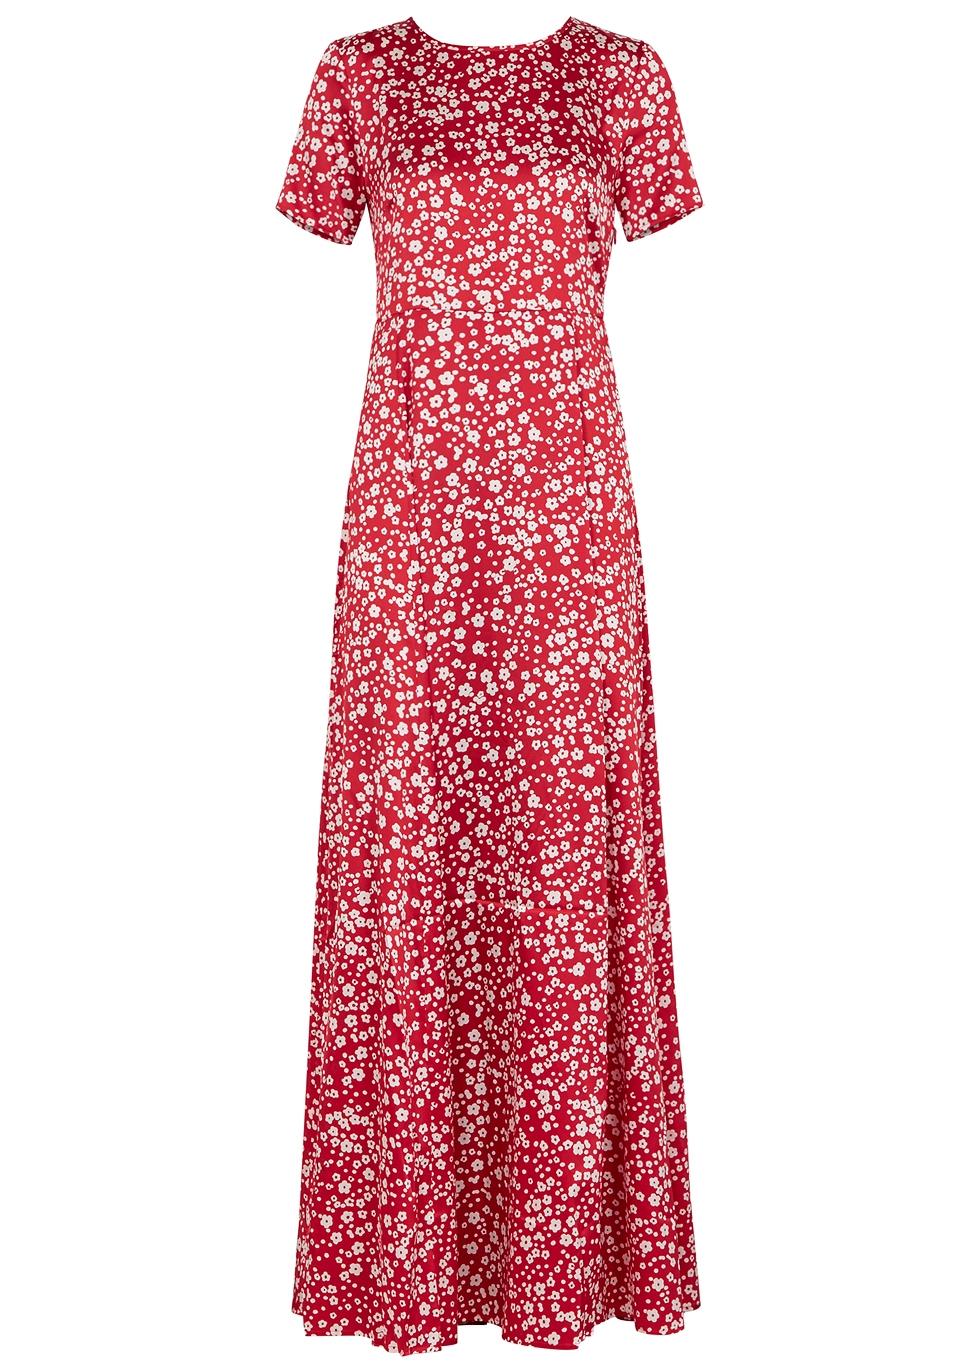 STINE GOYA NANNA FLORAL-PRINT SILK SATIN DRESS